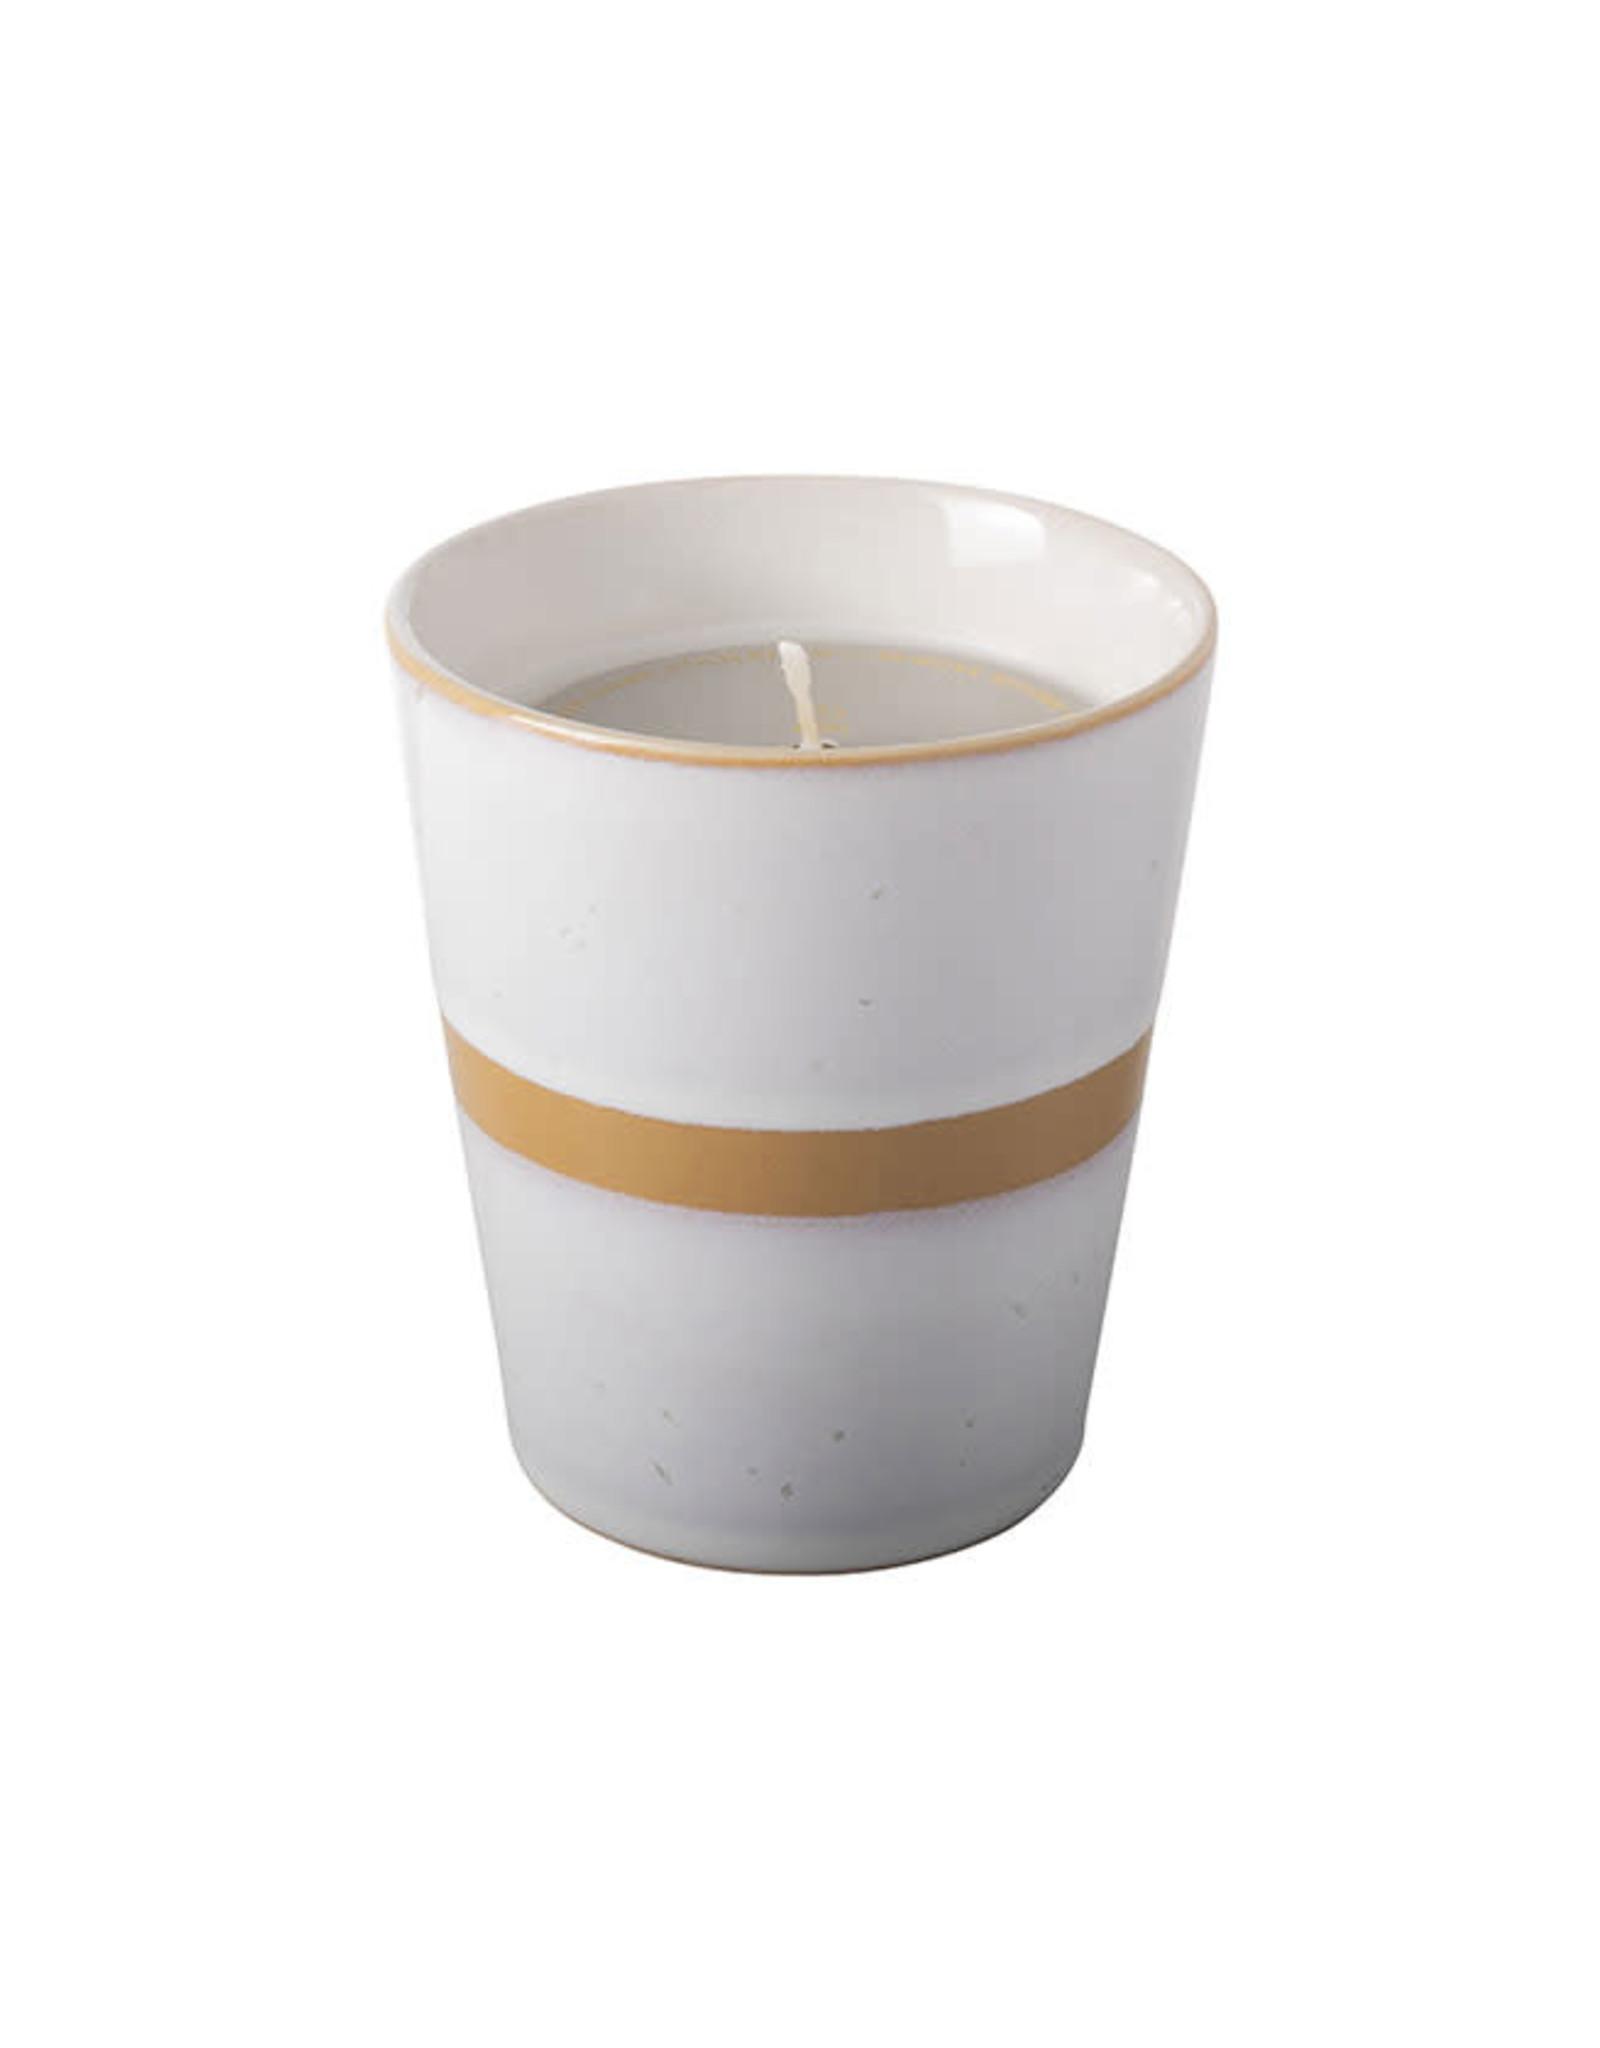 Kaars Keramisch/Koffiemokje-mustard